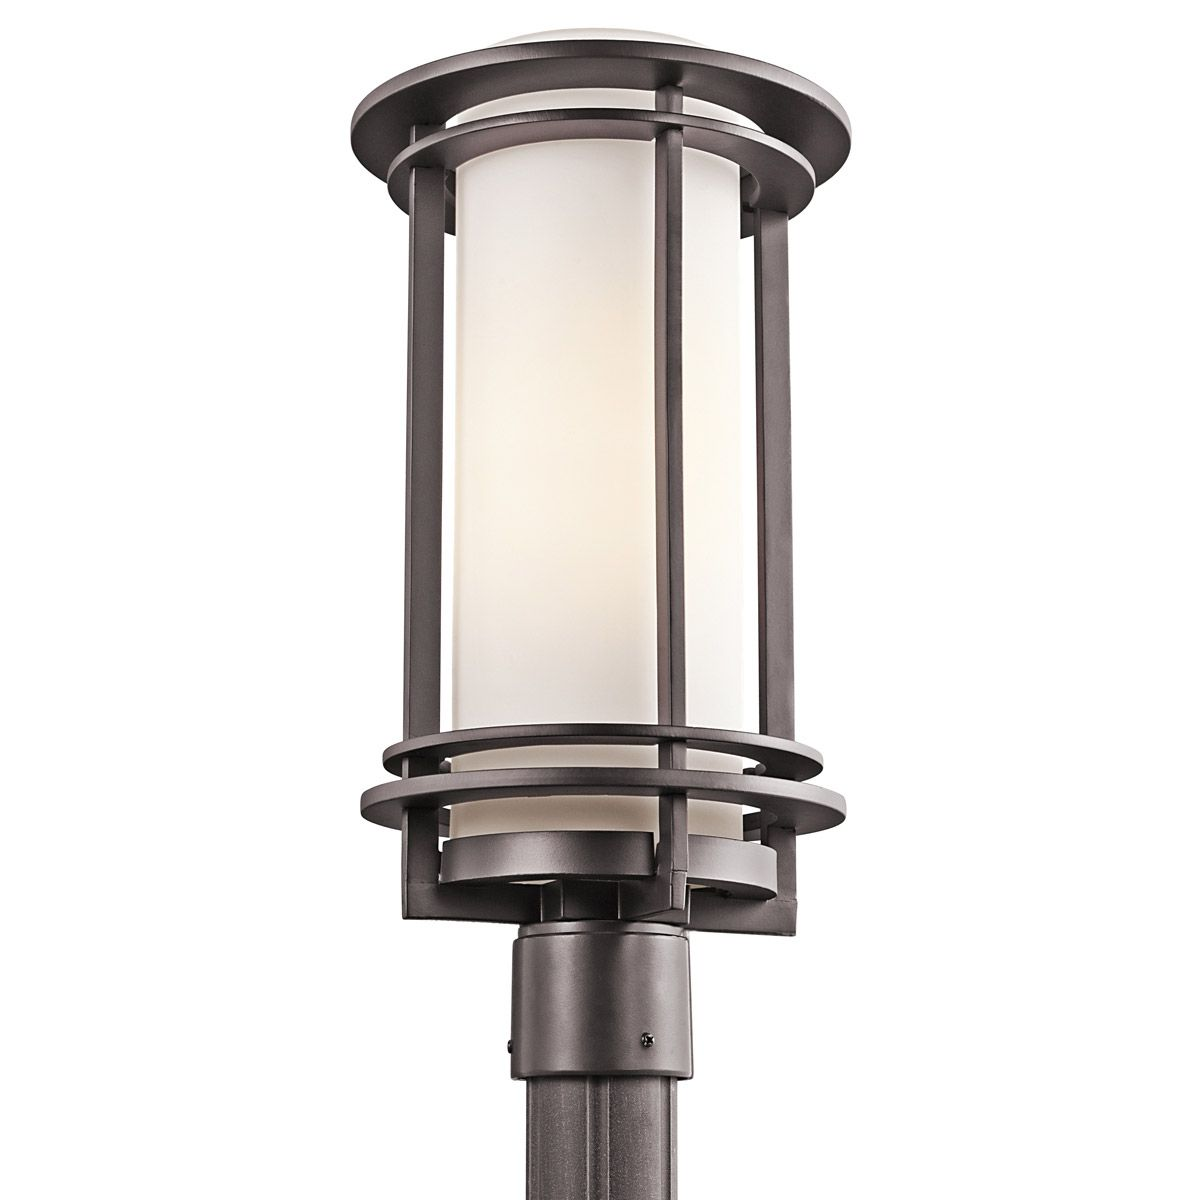 Kichler lighting 49349az pacific edge bronze outdoor post light mozeypictures Image collections